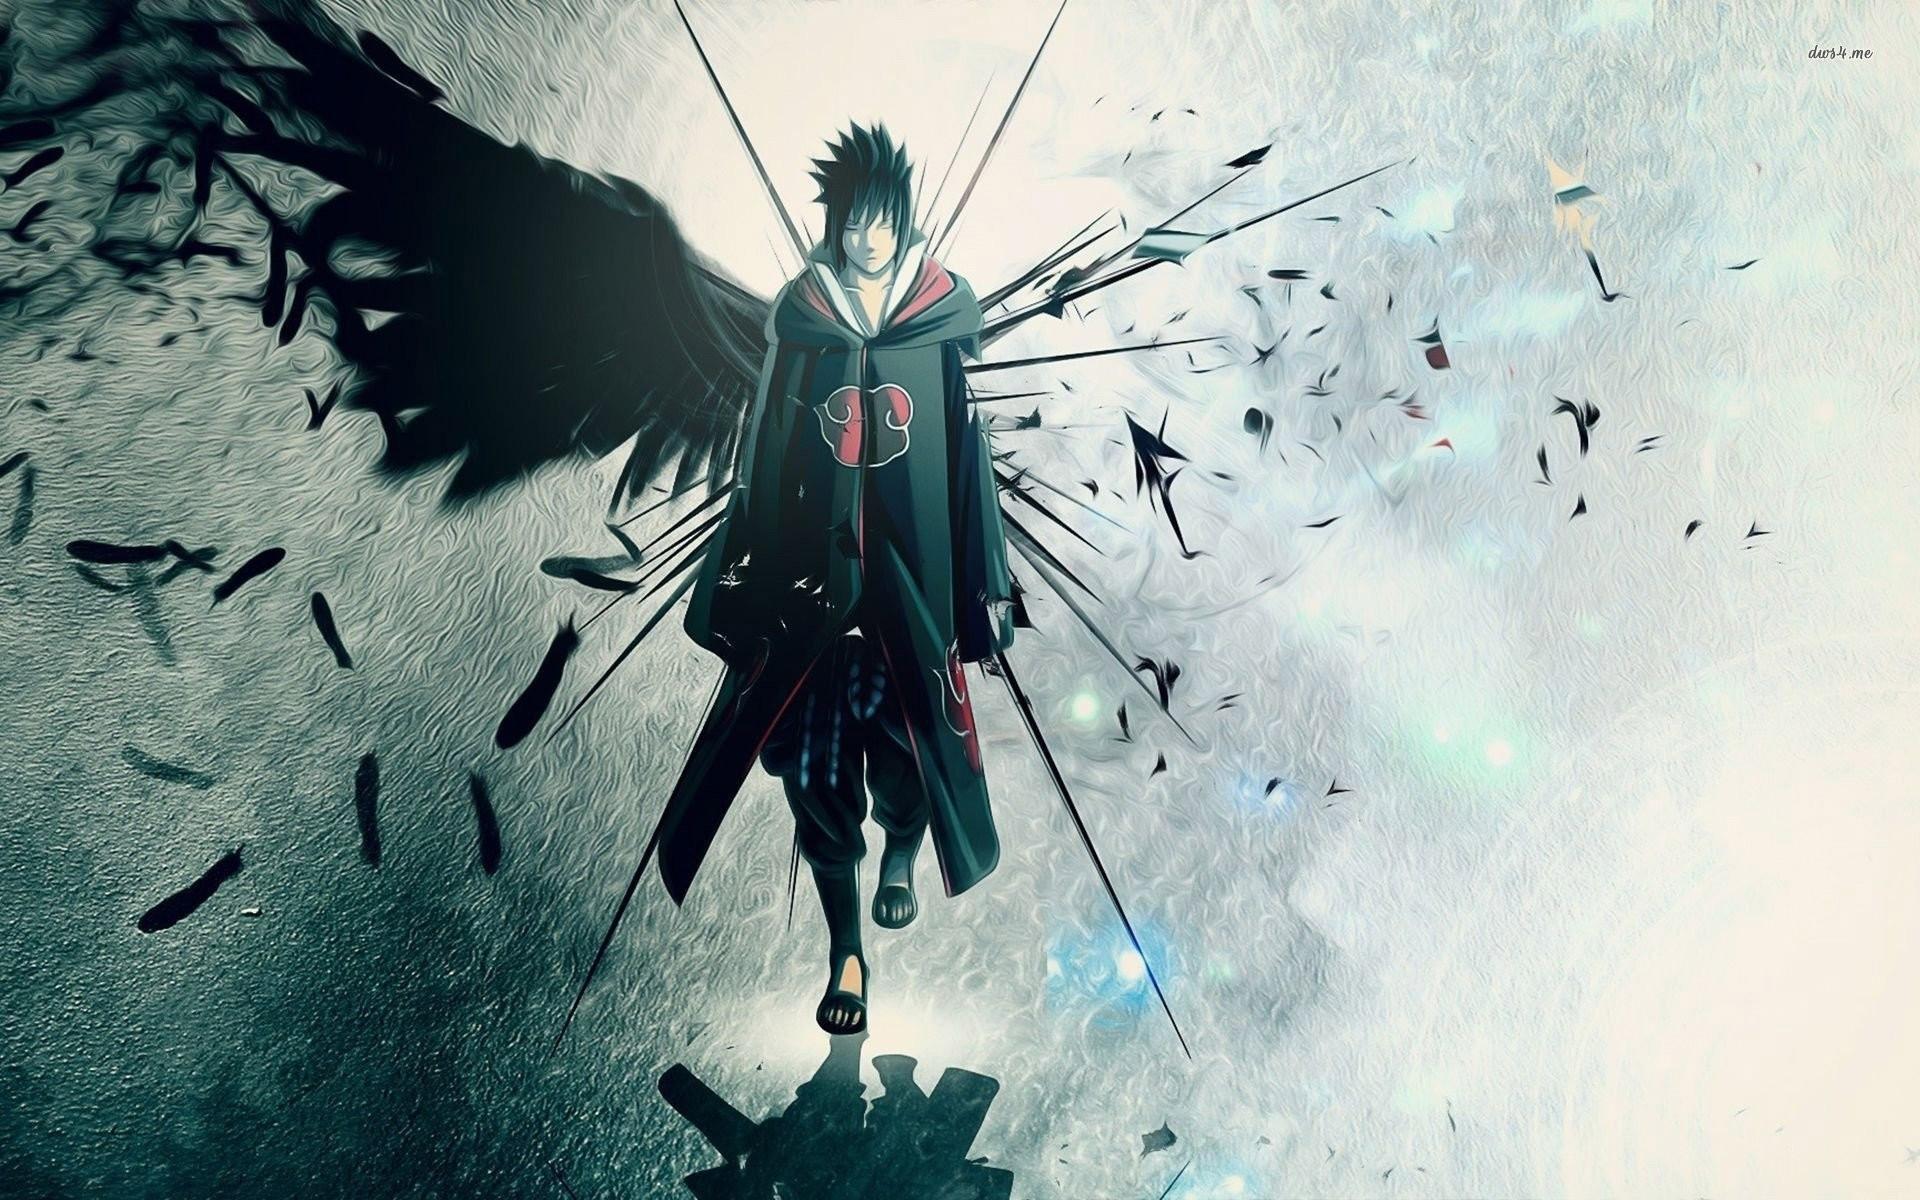 sasuke uchiha wallpapers hd (64+ images)